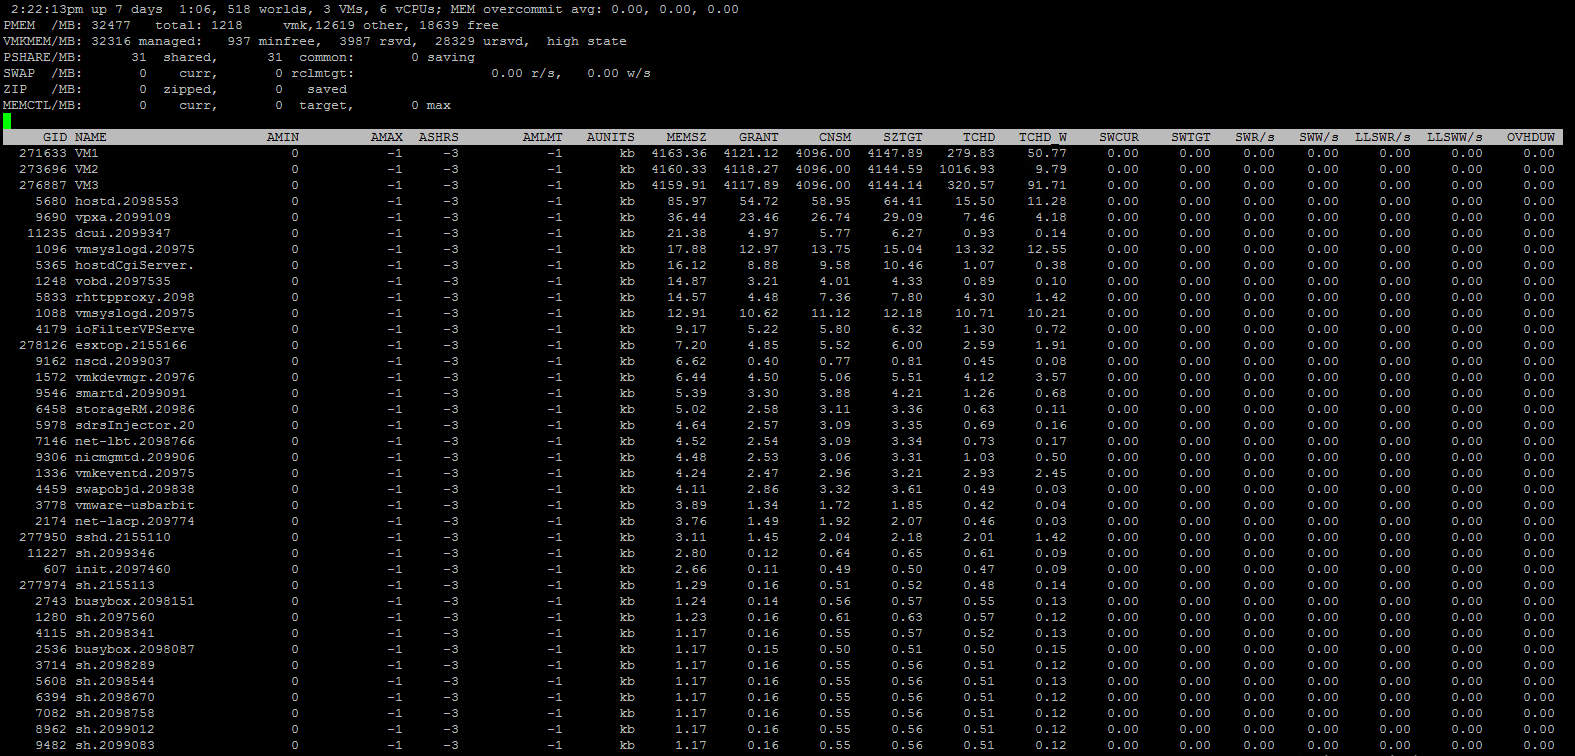 Esxtop tool memory usage statistics